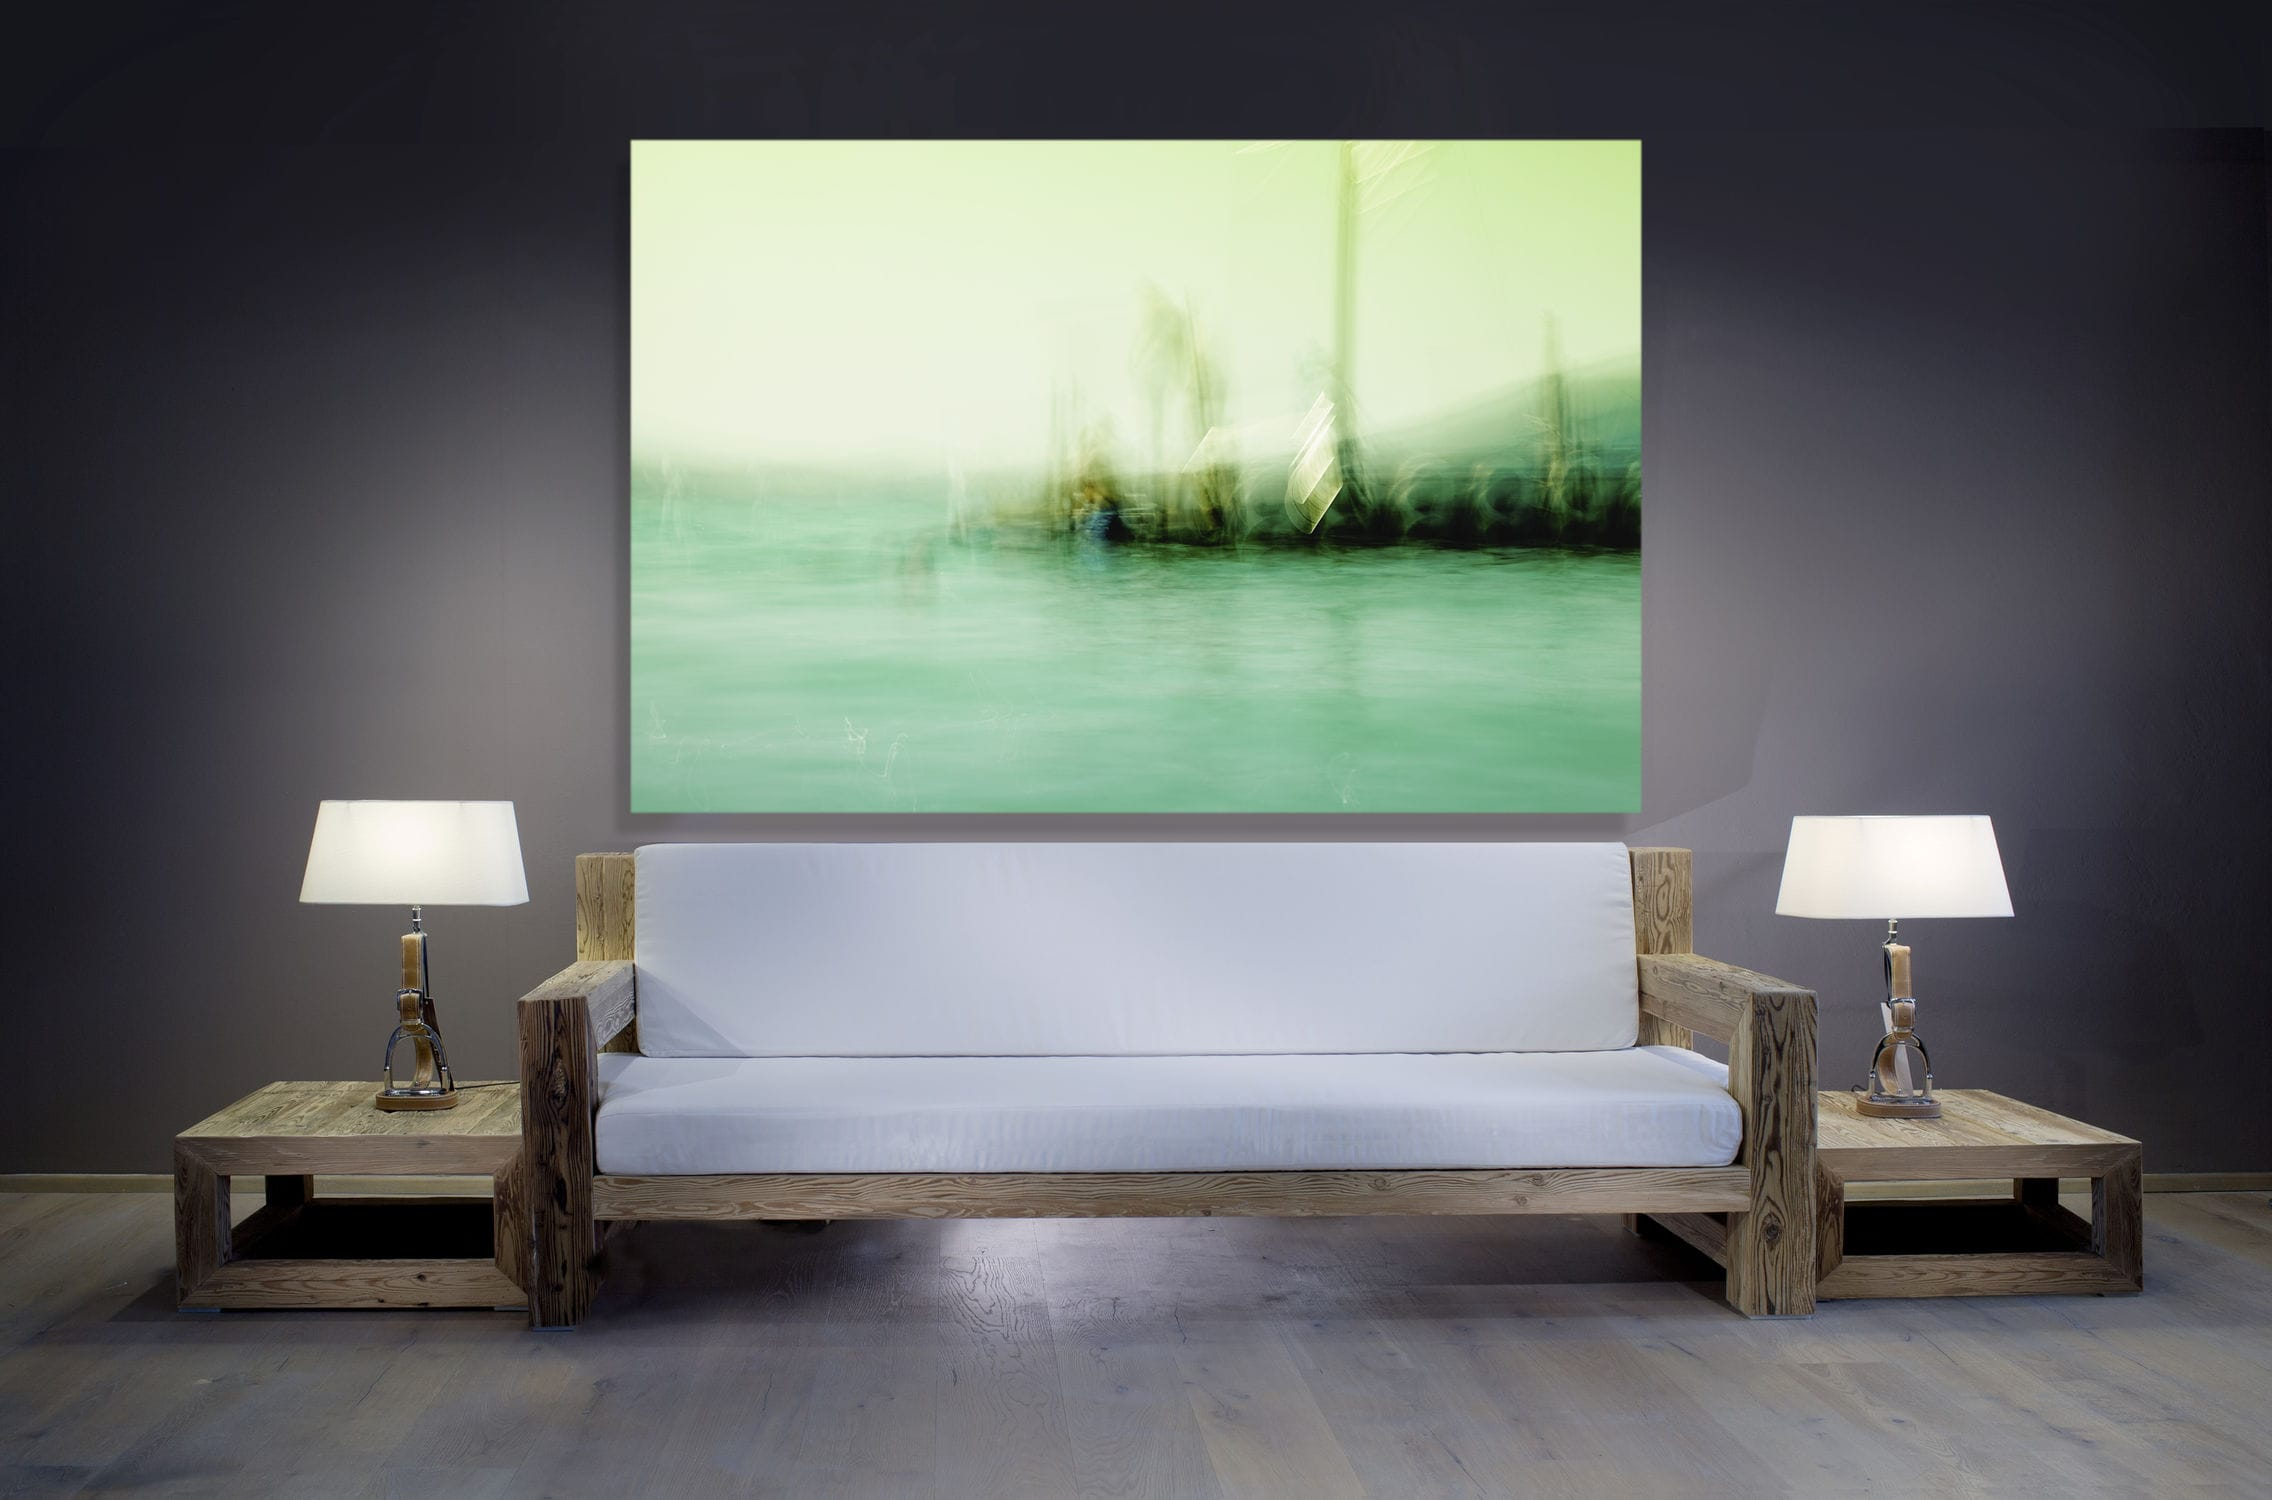 modernes sofa / garten / stoff / holz - by thomas reiner - alp maritim, Gartenarbeit ideen